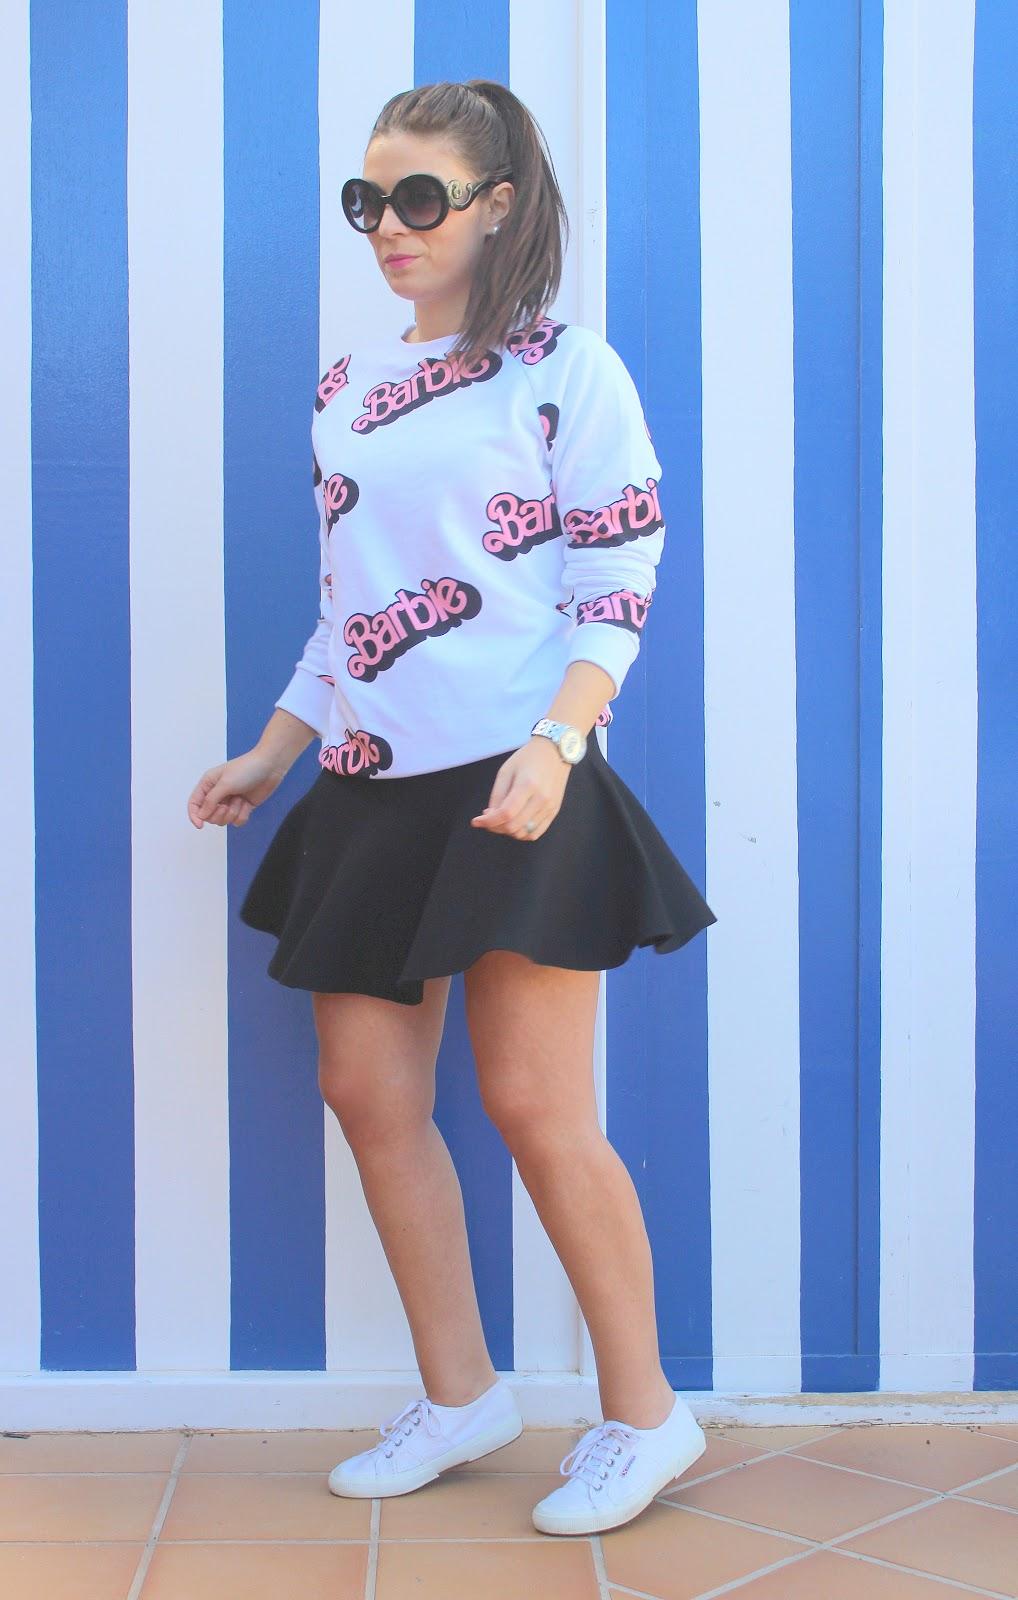 Barbie_Girl_The_Pink_Graff_03